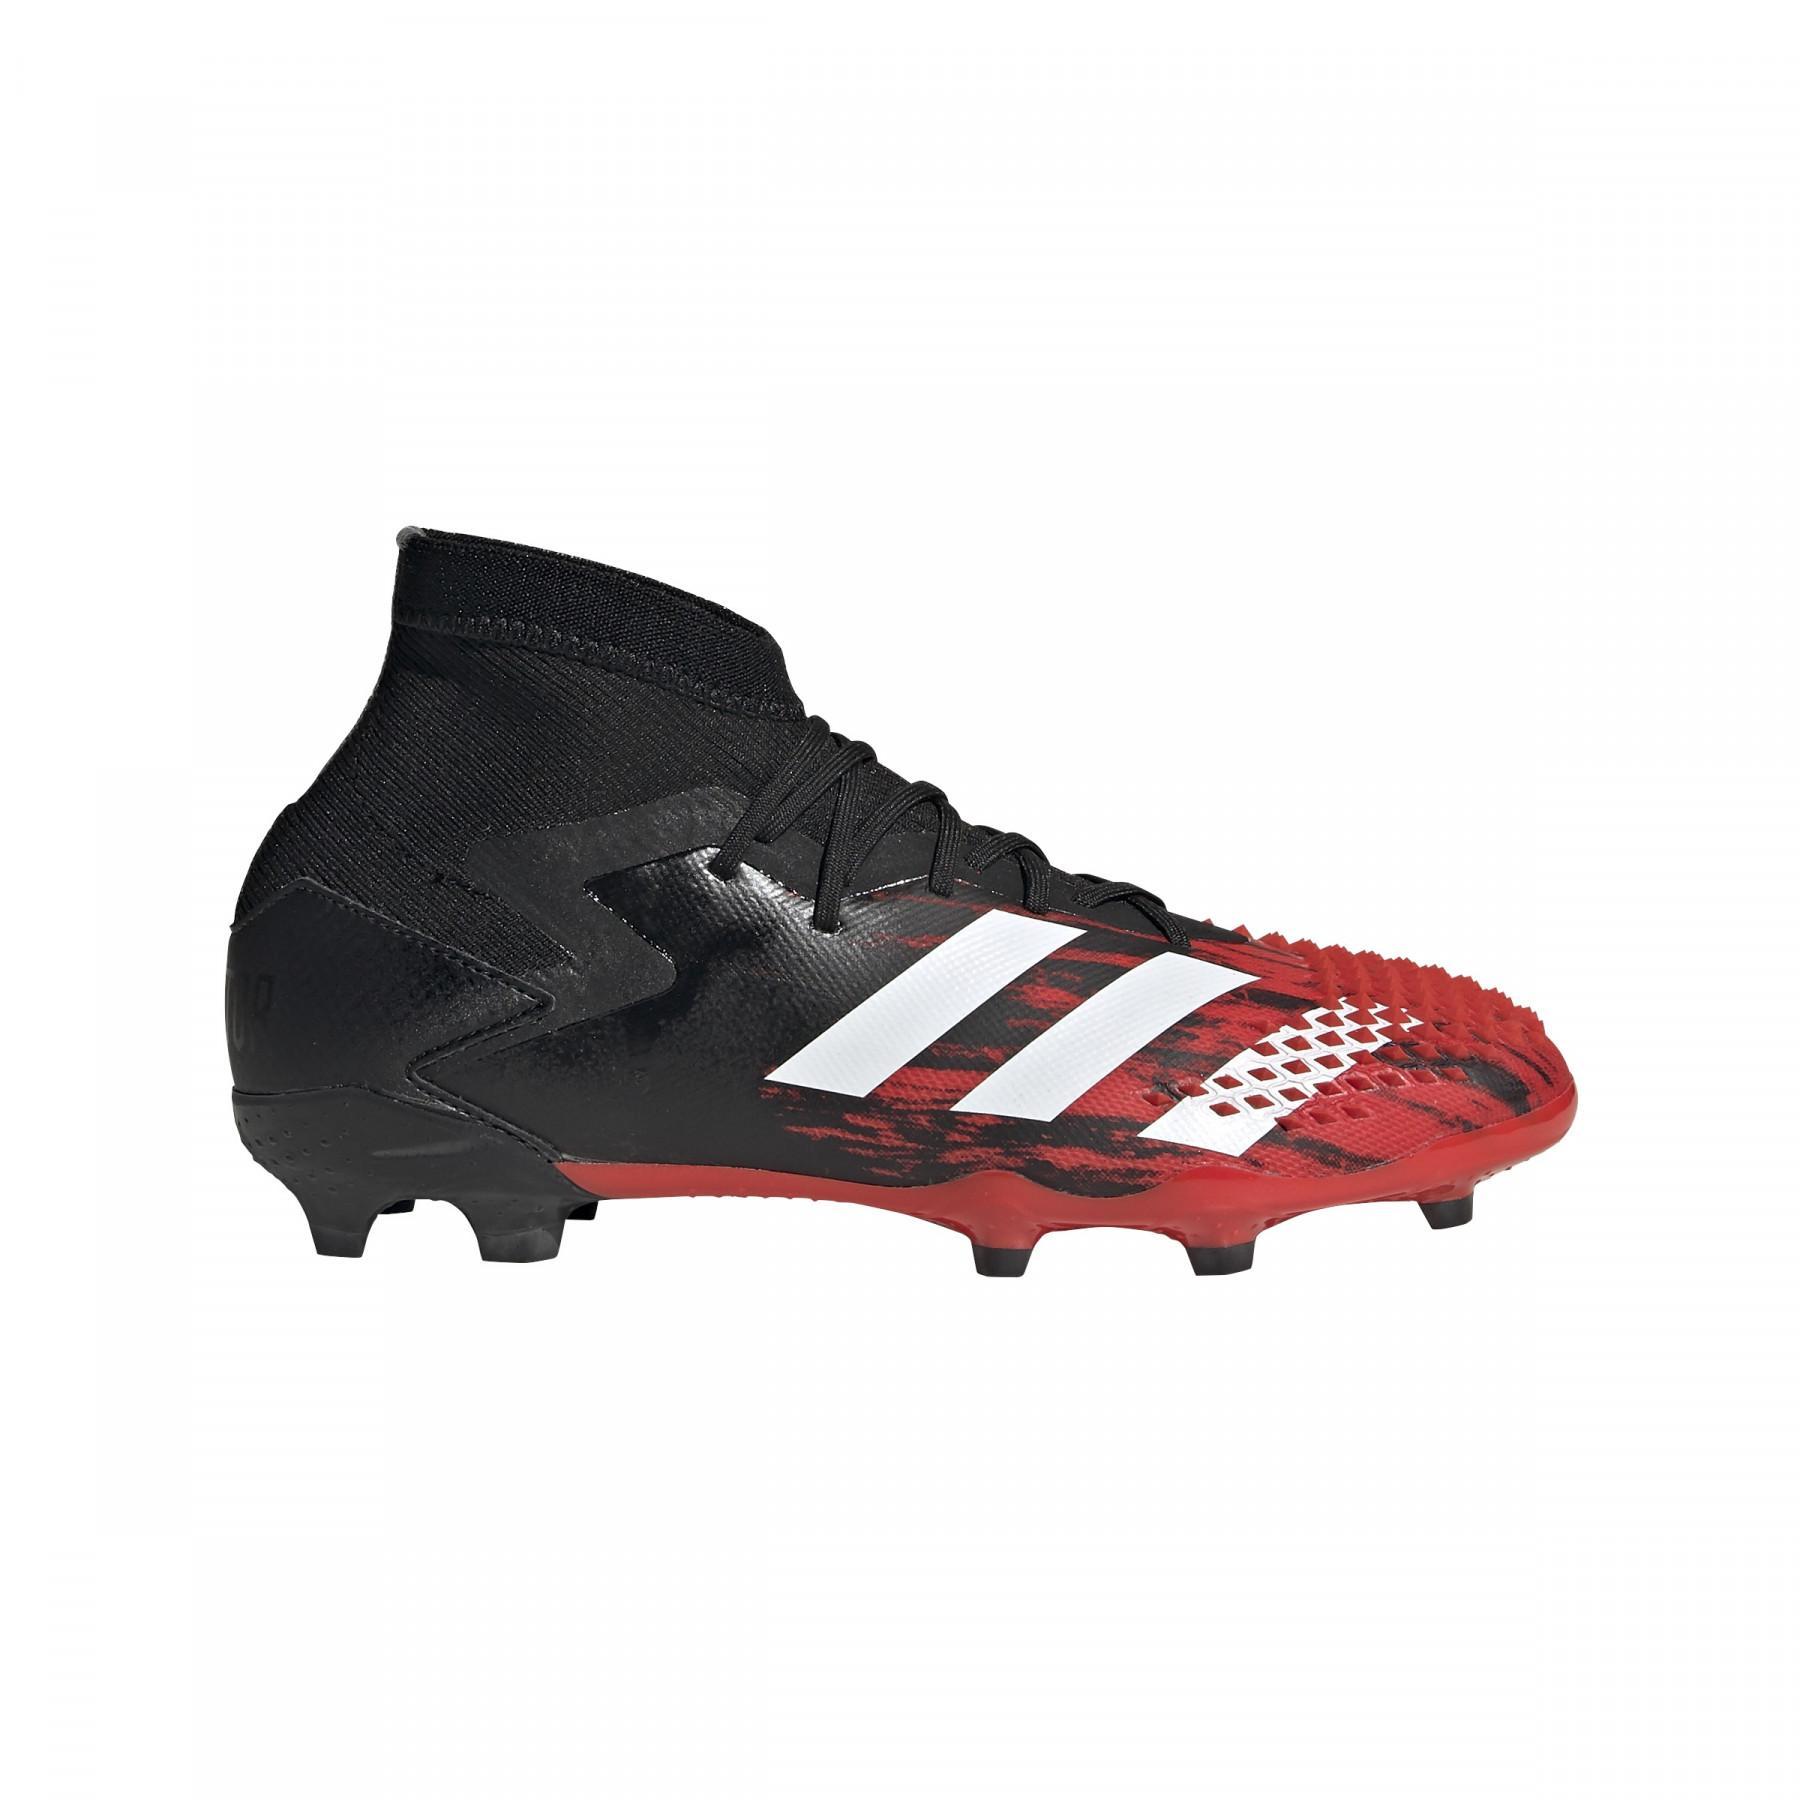 Chaussures junior adidas Predator Mutator 20.1 FG